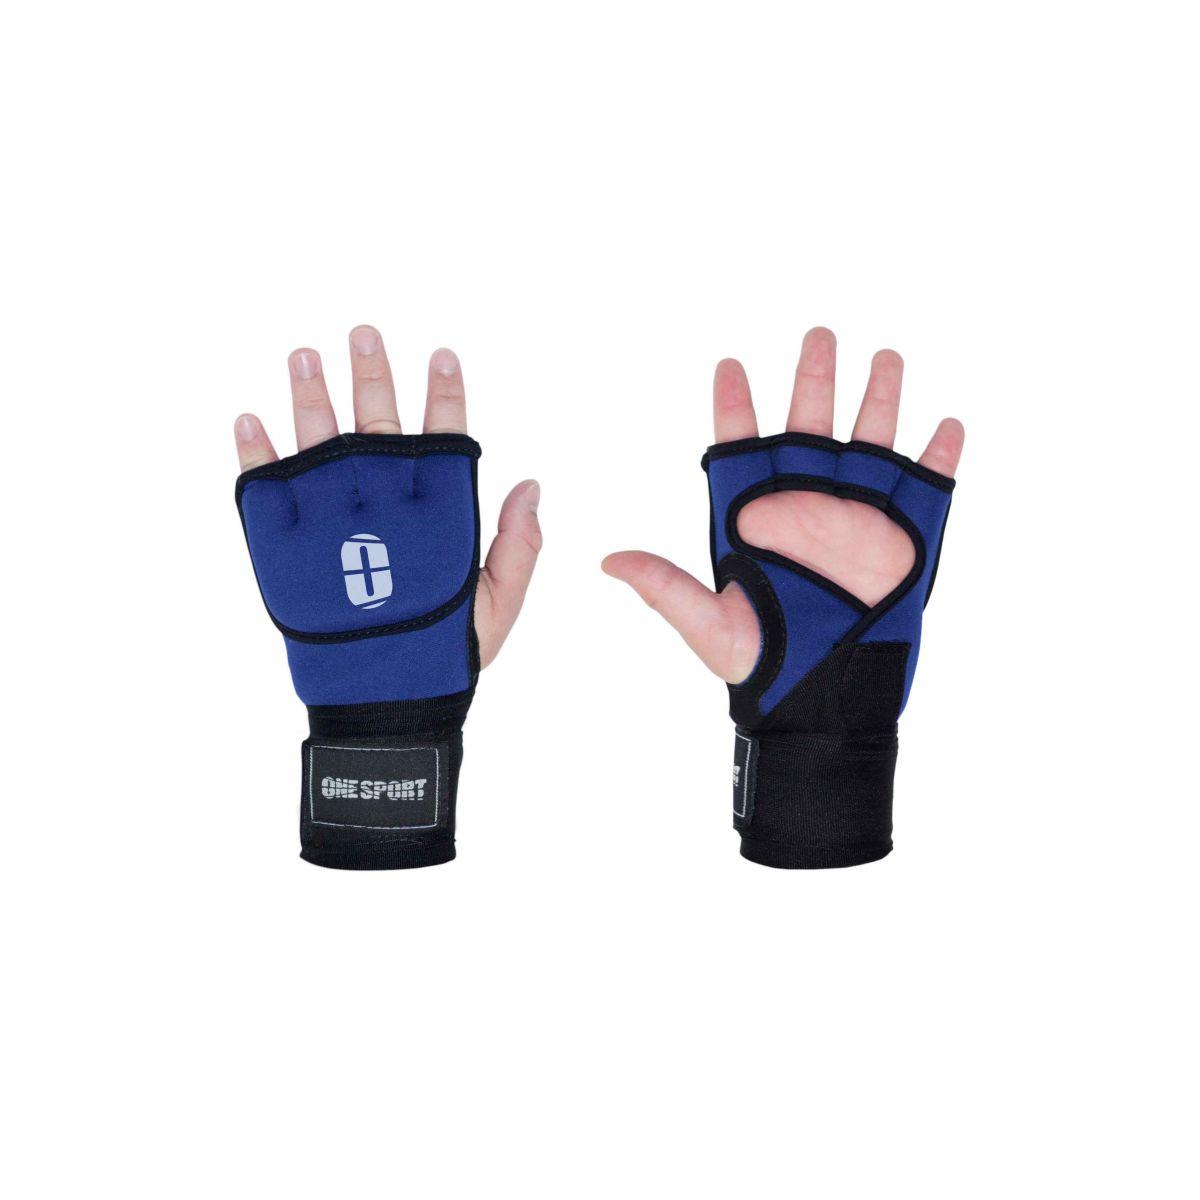 Luvas/Bandagem de Gel  - Unissex - One Sport  - Loja do Competidor